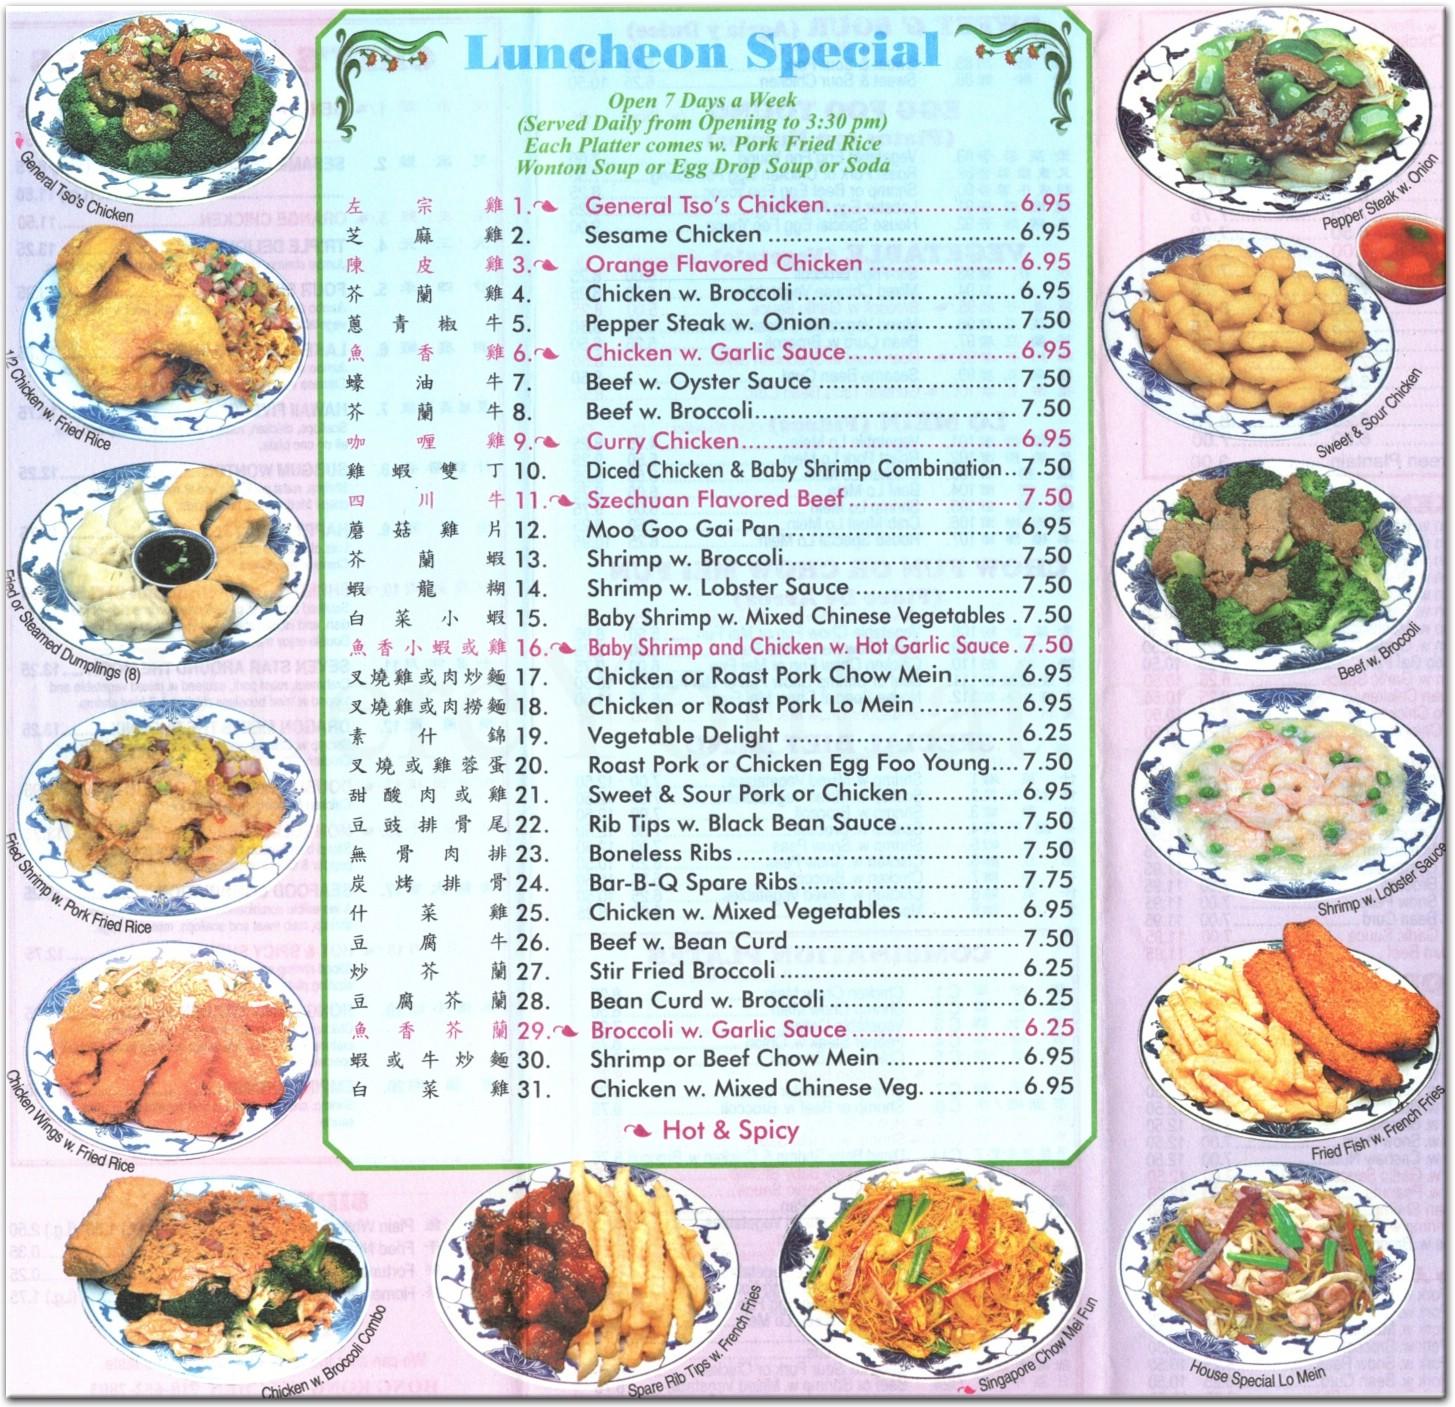 Hong Kong Kitchen Restaurant In The Bronx Official Menus Photos